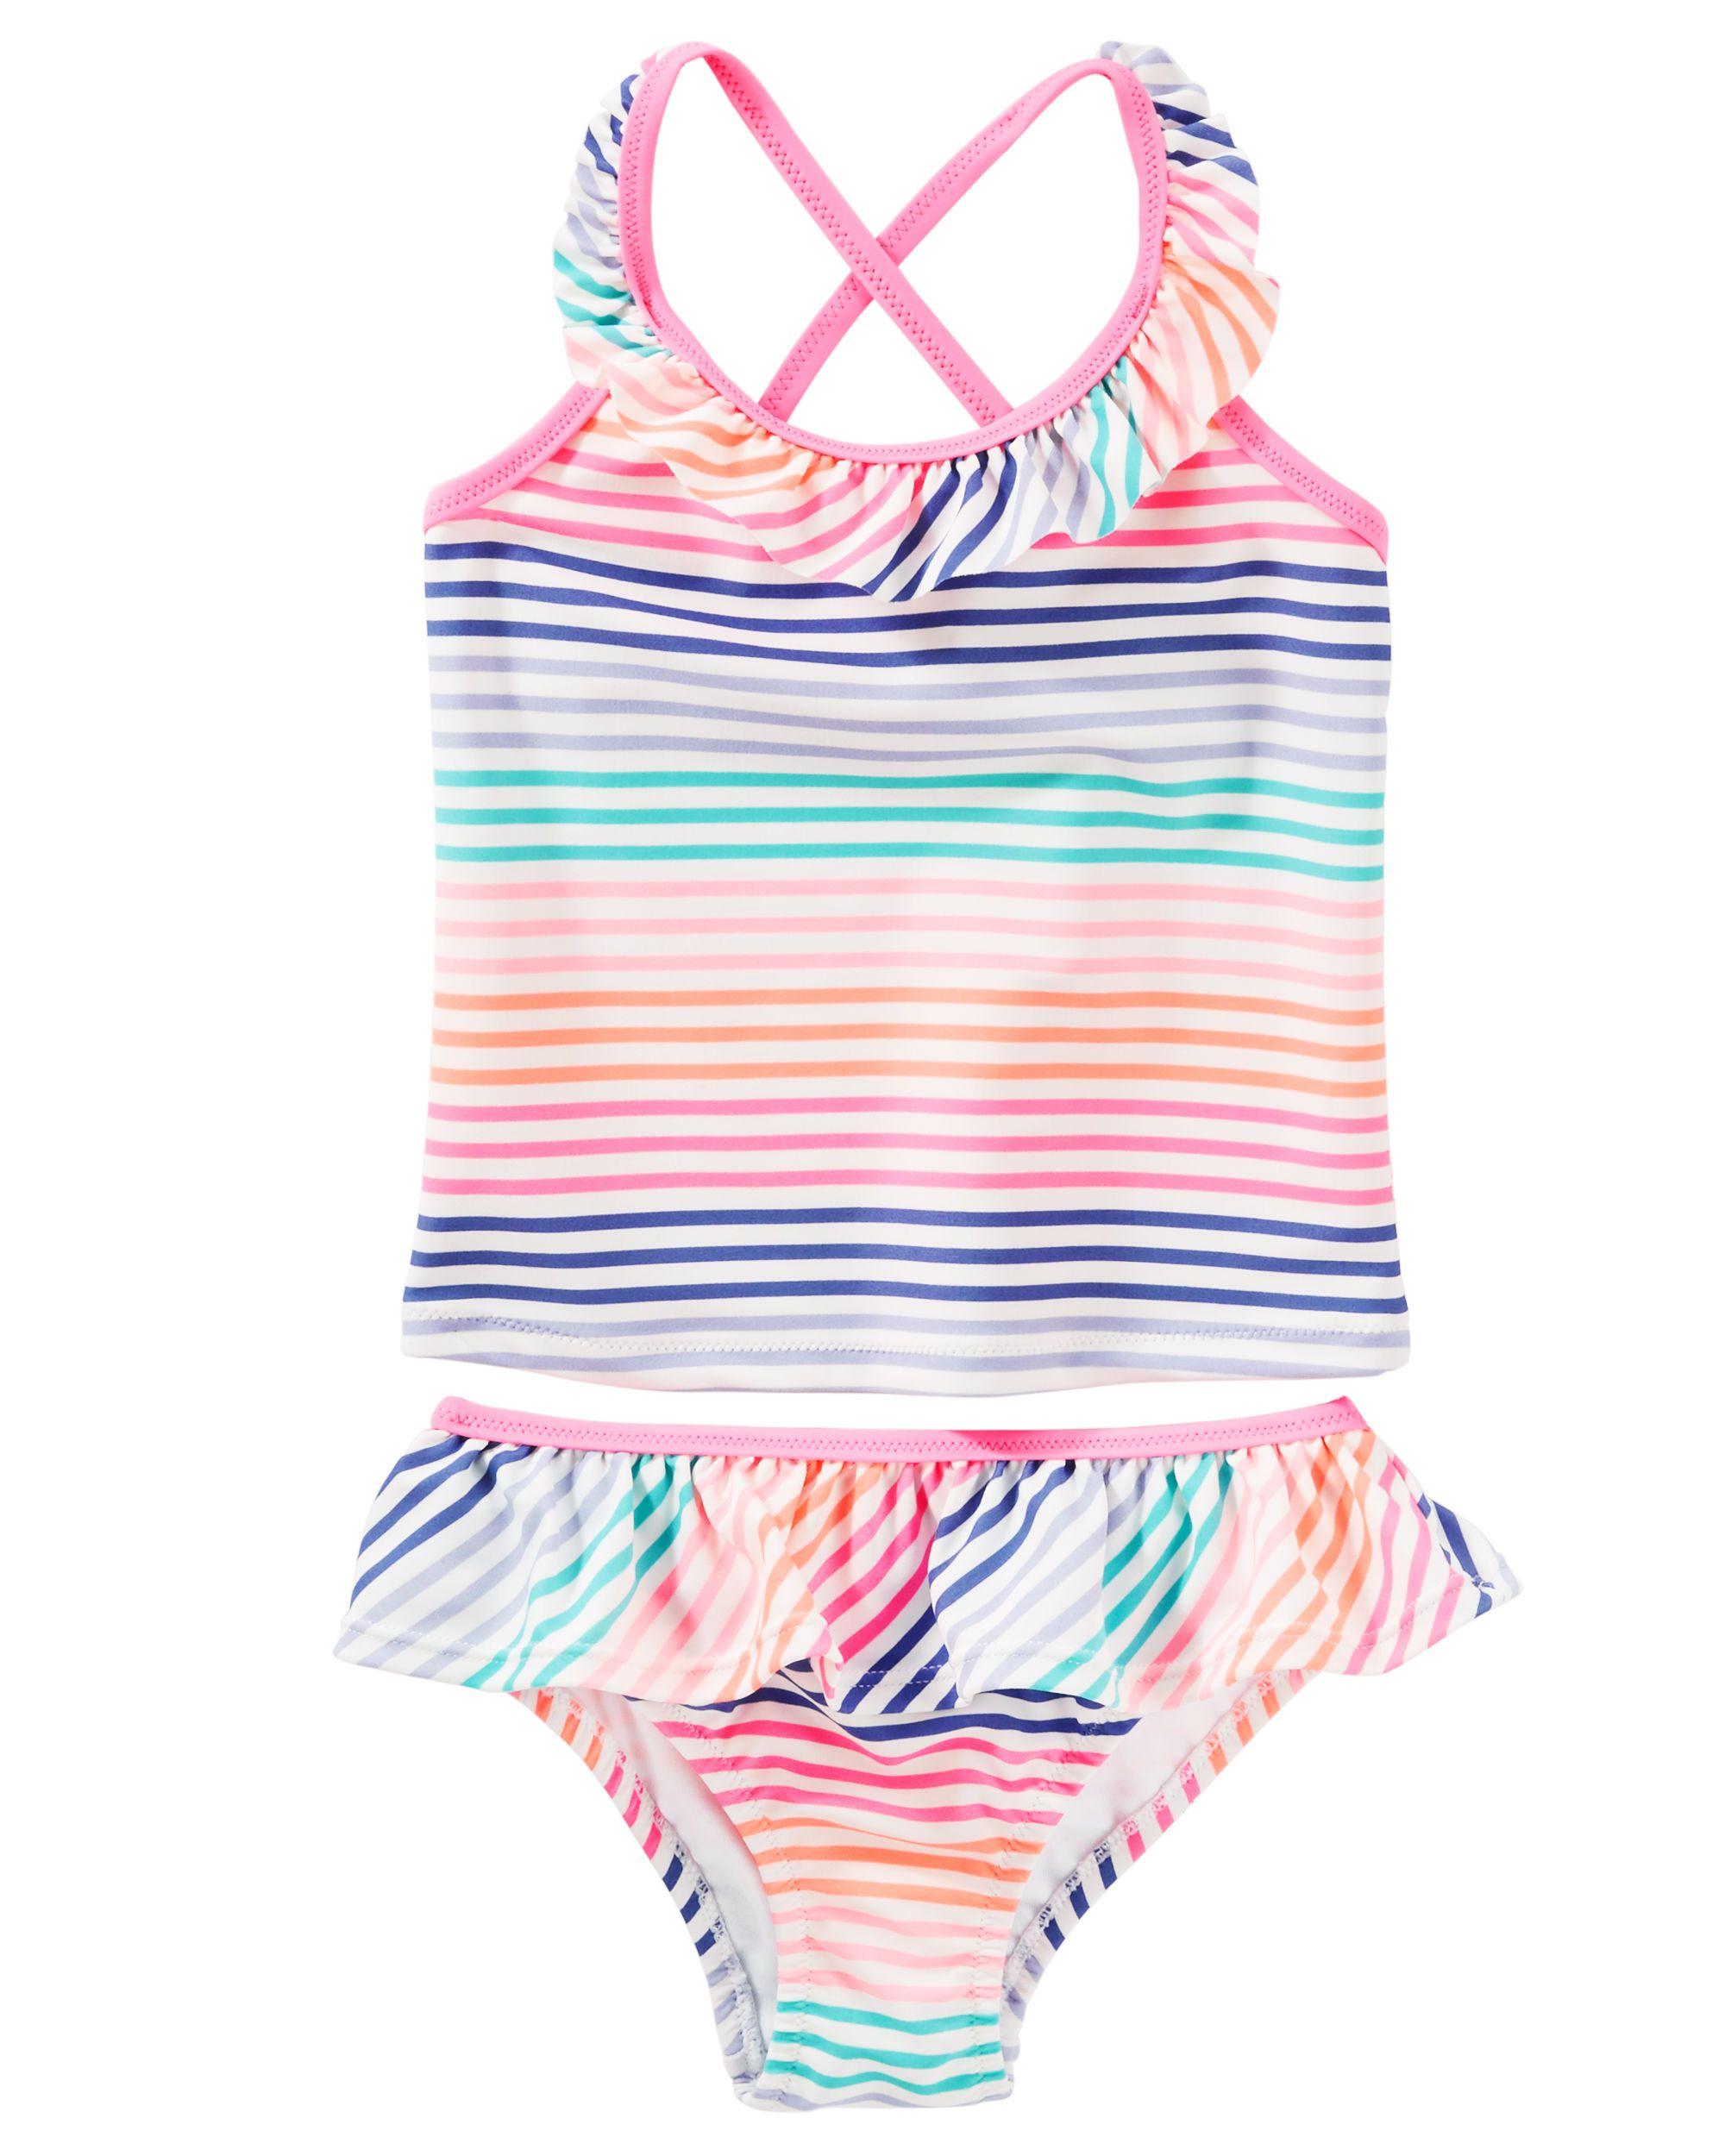 OshKosh Little Girls Striped Ruffle One Piece Swimsuit 3t